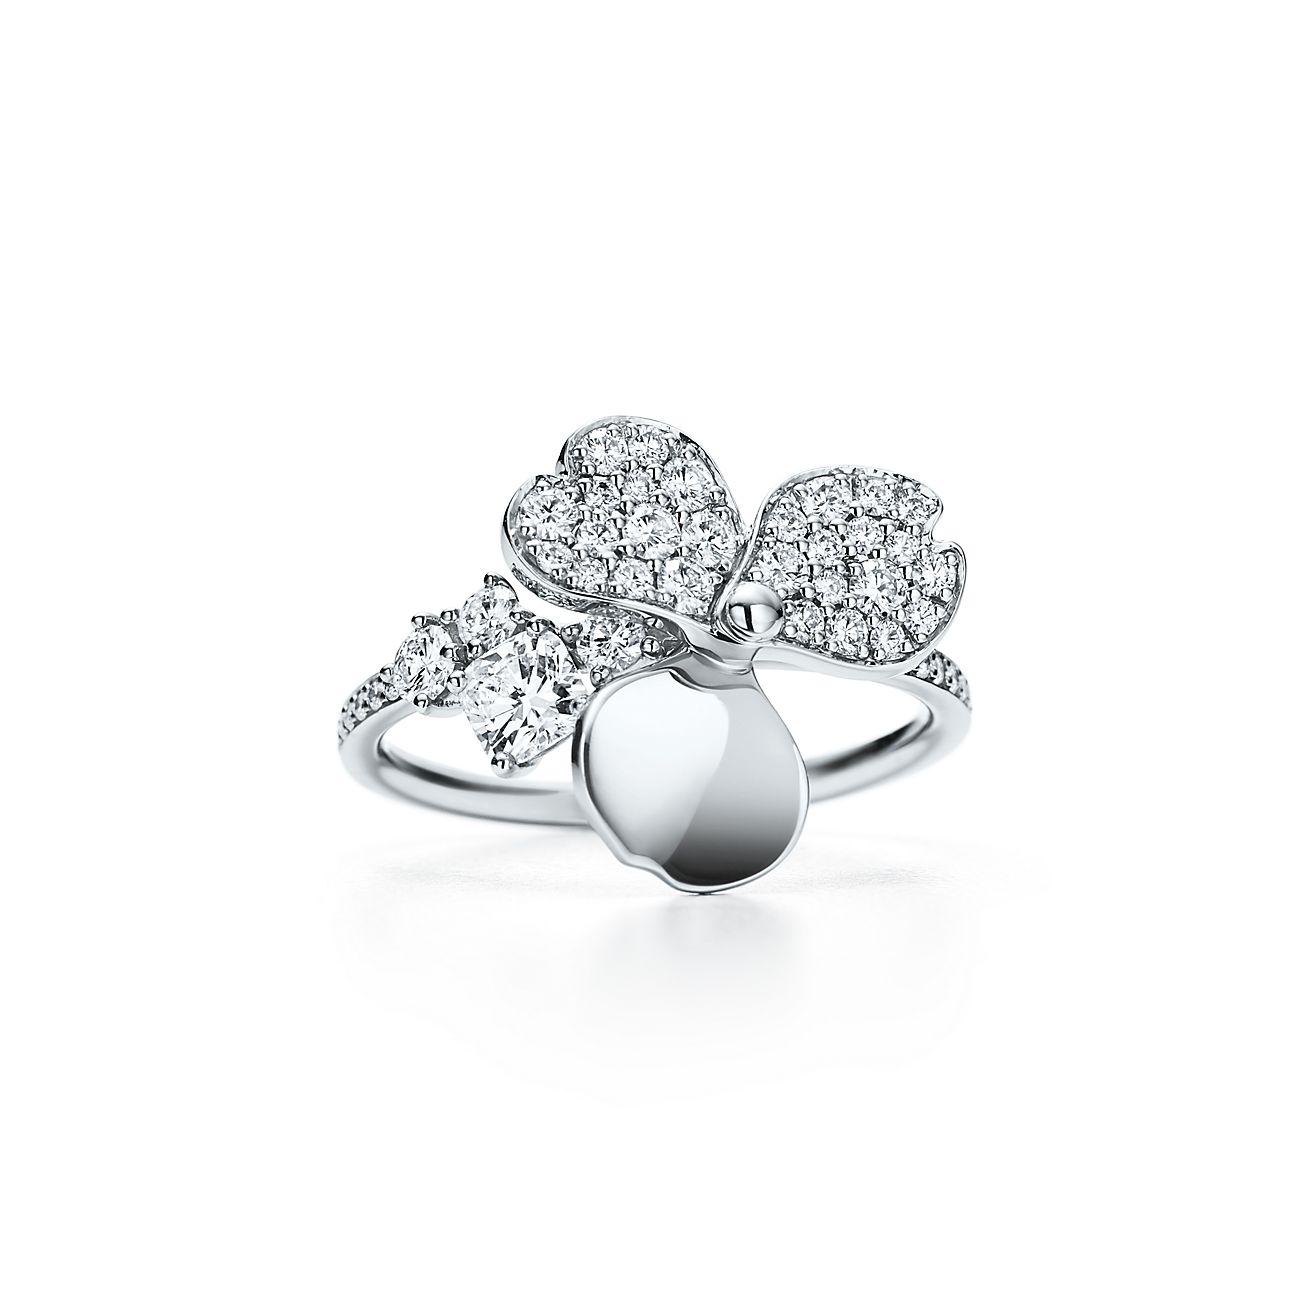 Tiffany Paper Flowers Diamond Flower Ring In Platinum Tiffany Co